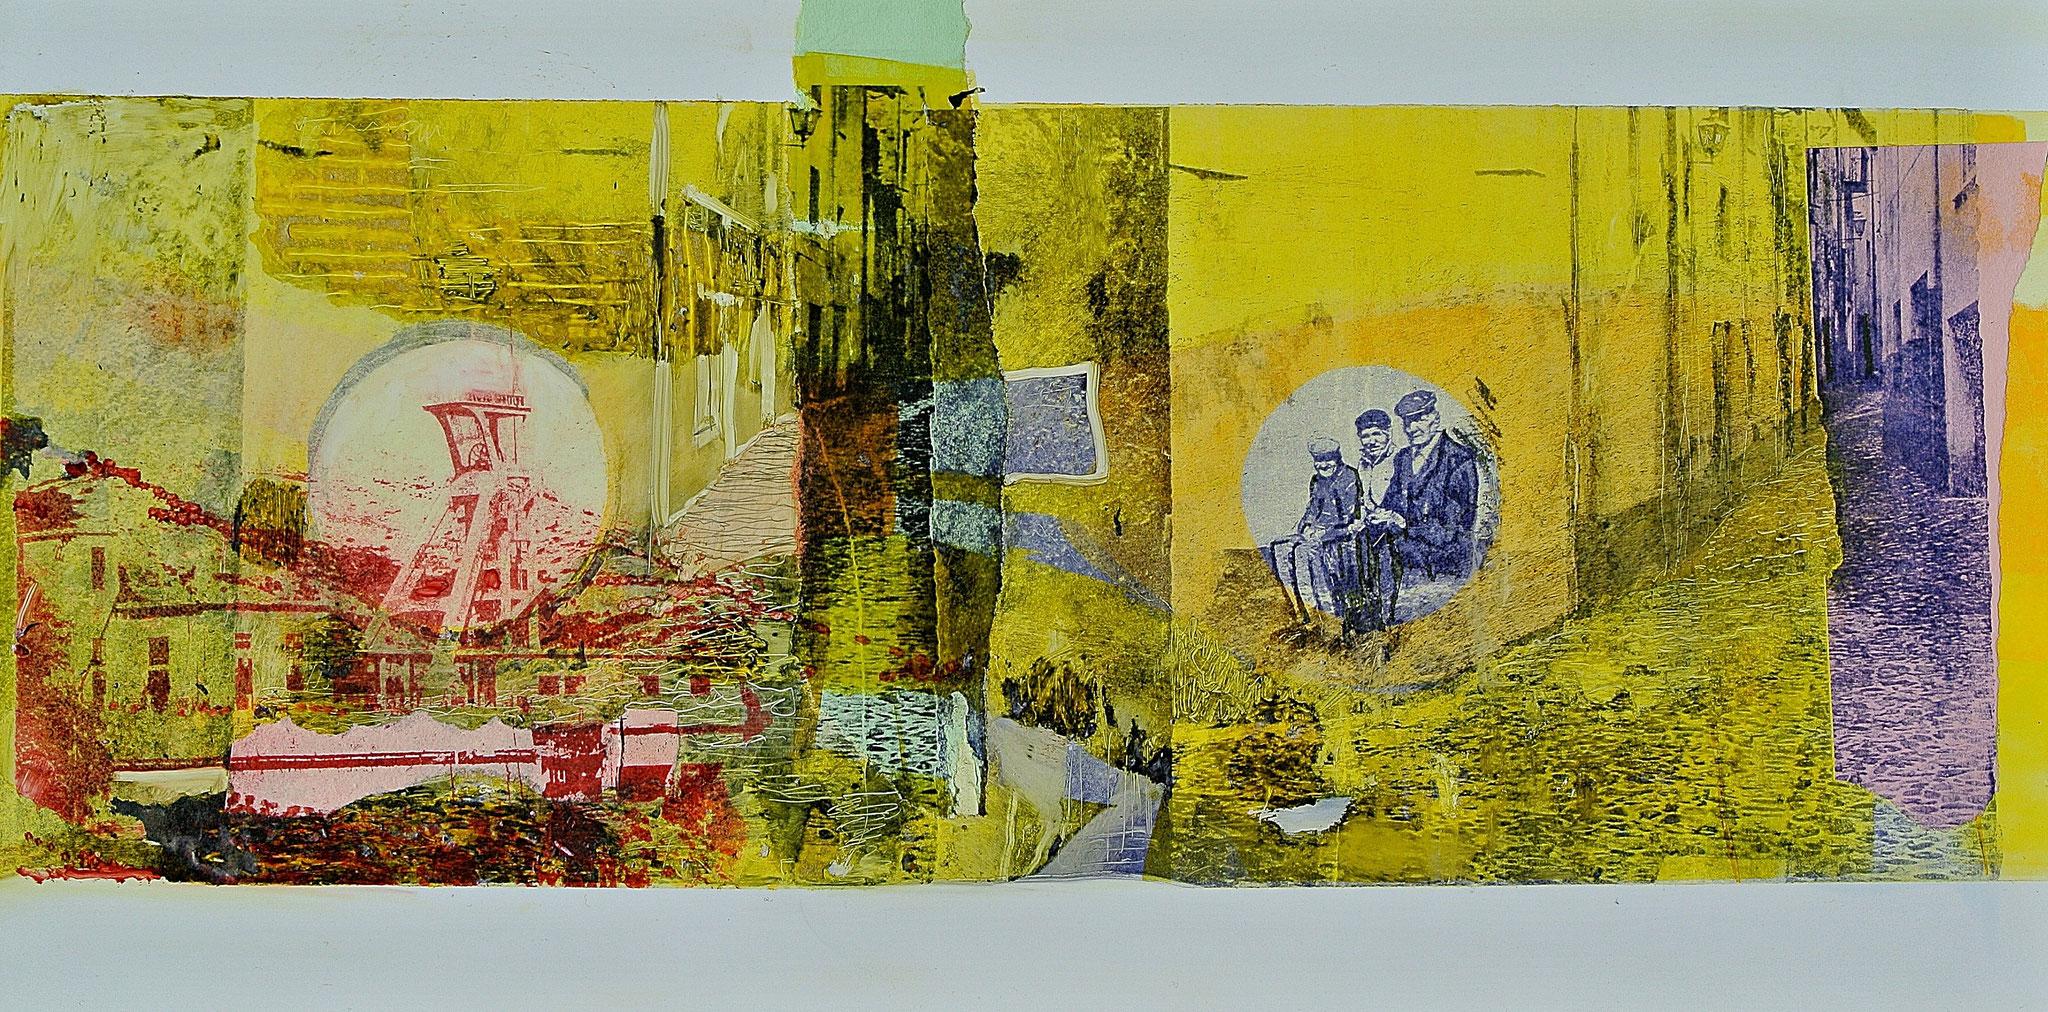 """Ein Leben in Montevecchio"" Monotypie /Gumprint auf DIBOND- Aluminiumplatte"